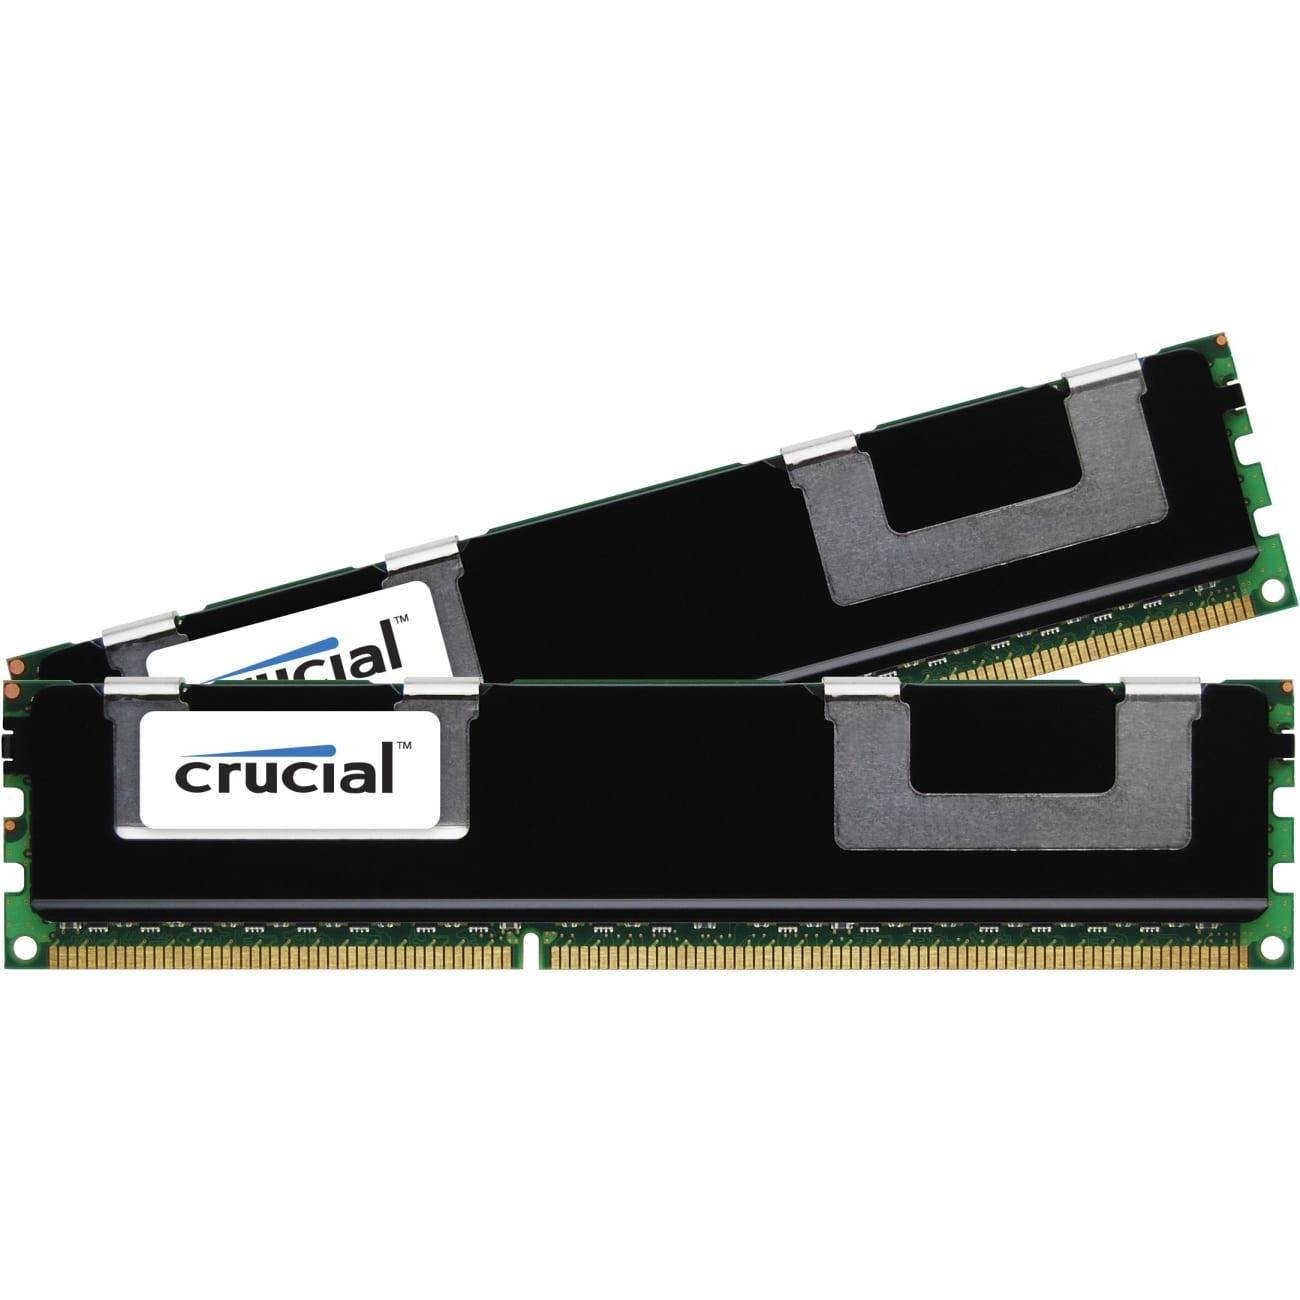 Crucial 16GB kit (2x8GB) 1600MHz DDR3L VLP RDIMM Memory